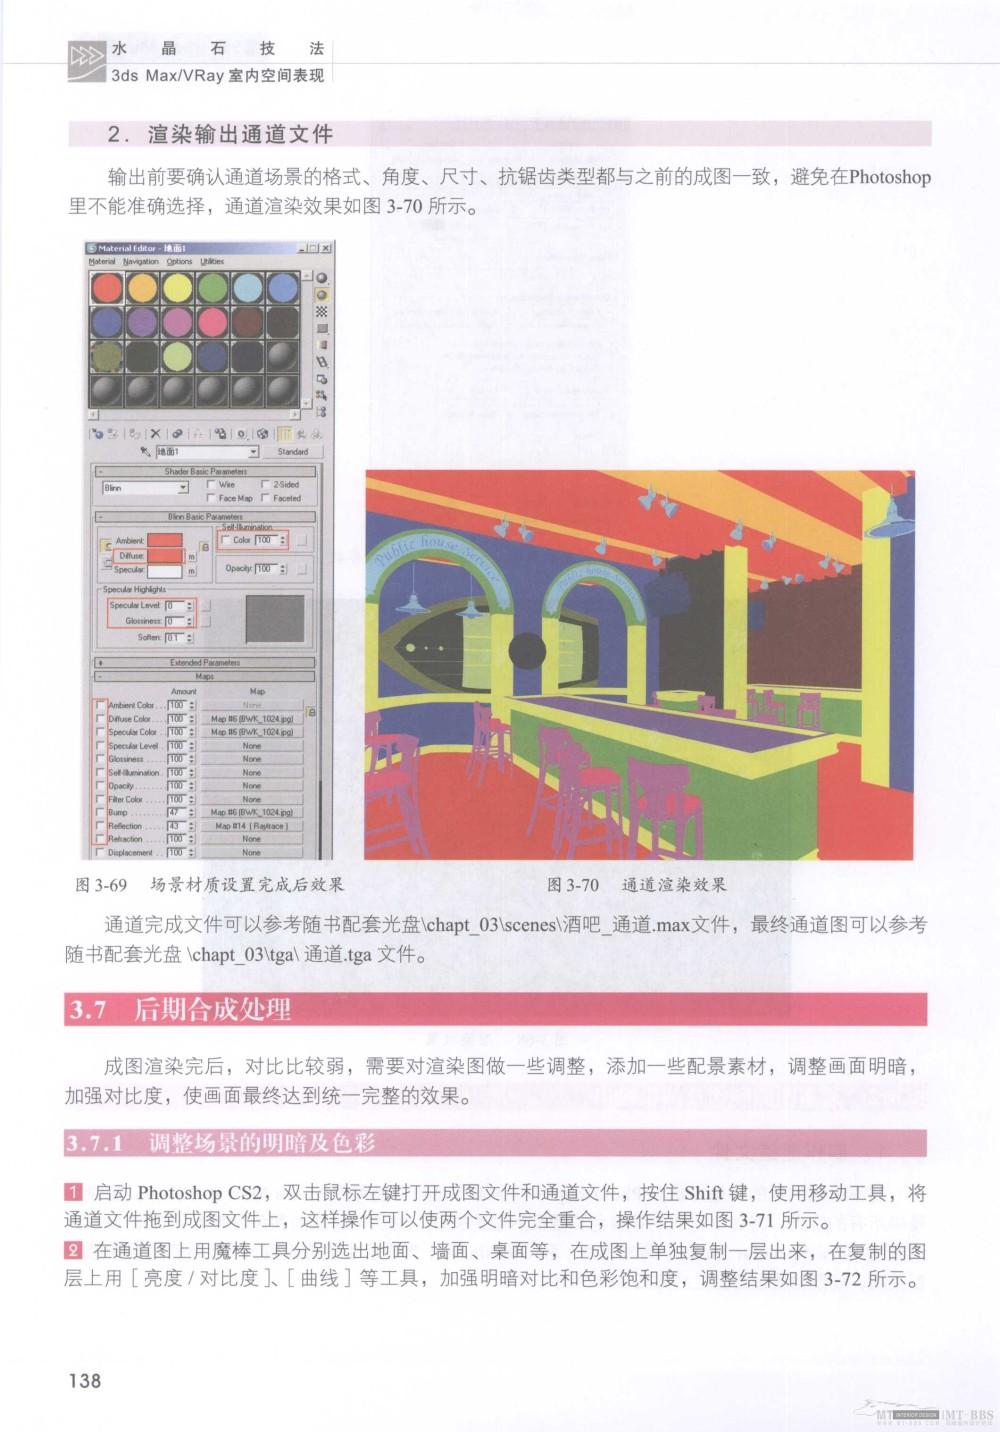 水晶石技法-3ds_Max&VRay室内空间表现_水晶石技法-3ds_Max&VRay室内空间表现_页面_144.jpg